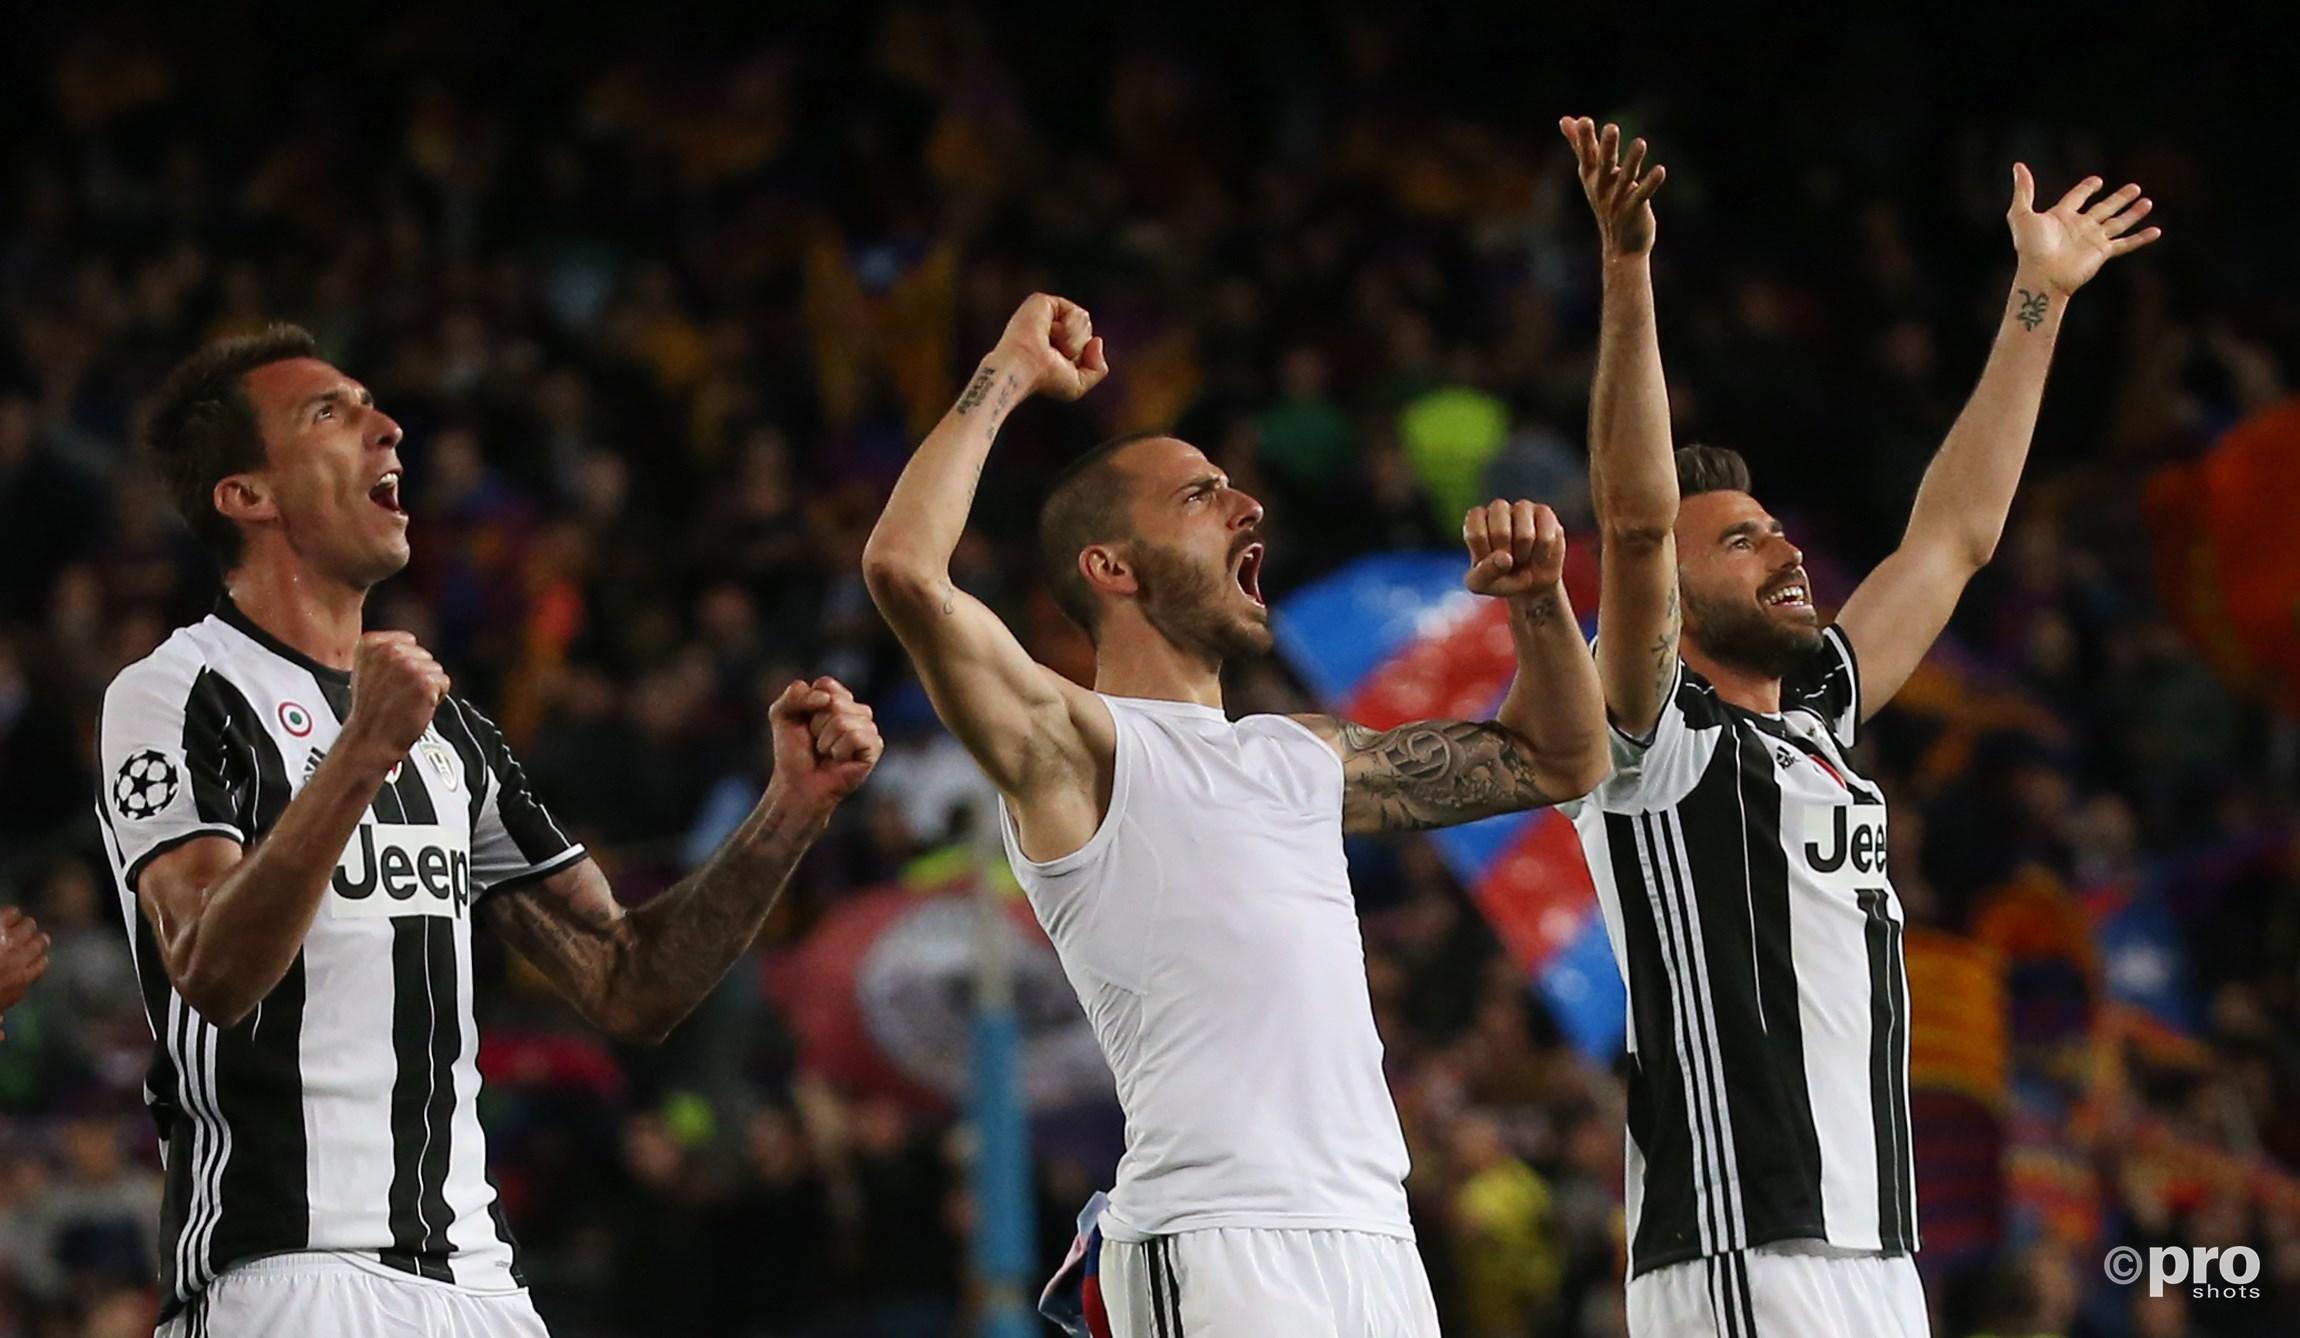 Mario Mandzukic, Leonardo Bonucci en Andrea Barzagli vieren feest. (PRO SHOTS/Action Images)